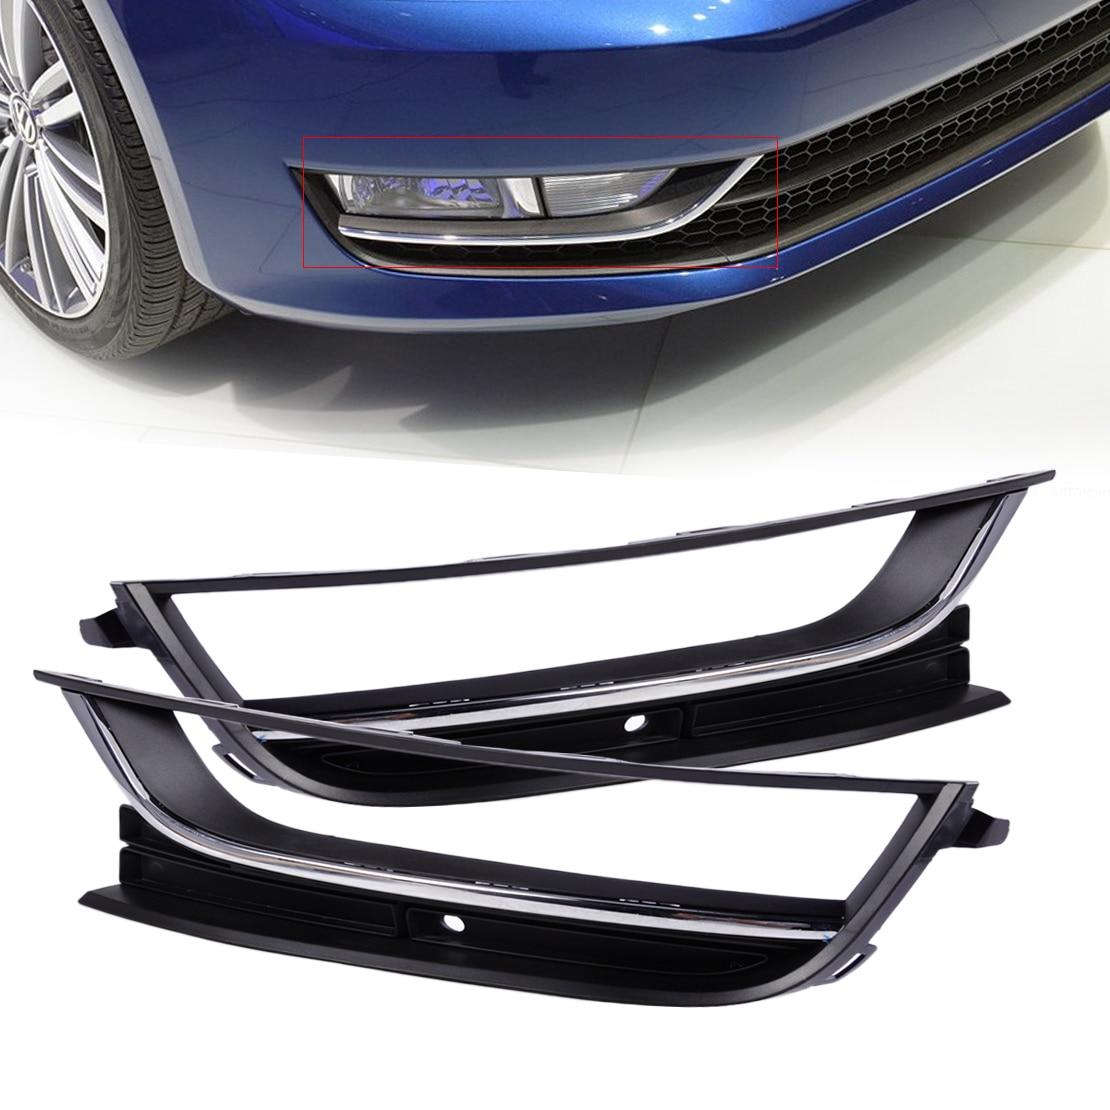 DWCX 56D853665 56D853666 Front Bumper Left + Right Fog Light Lamp Grille for VW Passat NMS 2012 2013 2014 only America Model